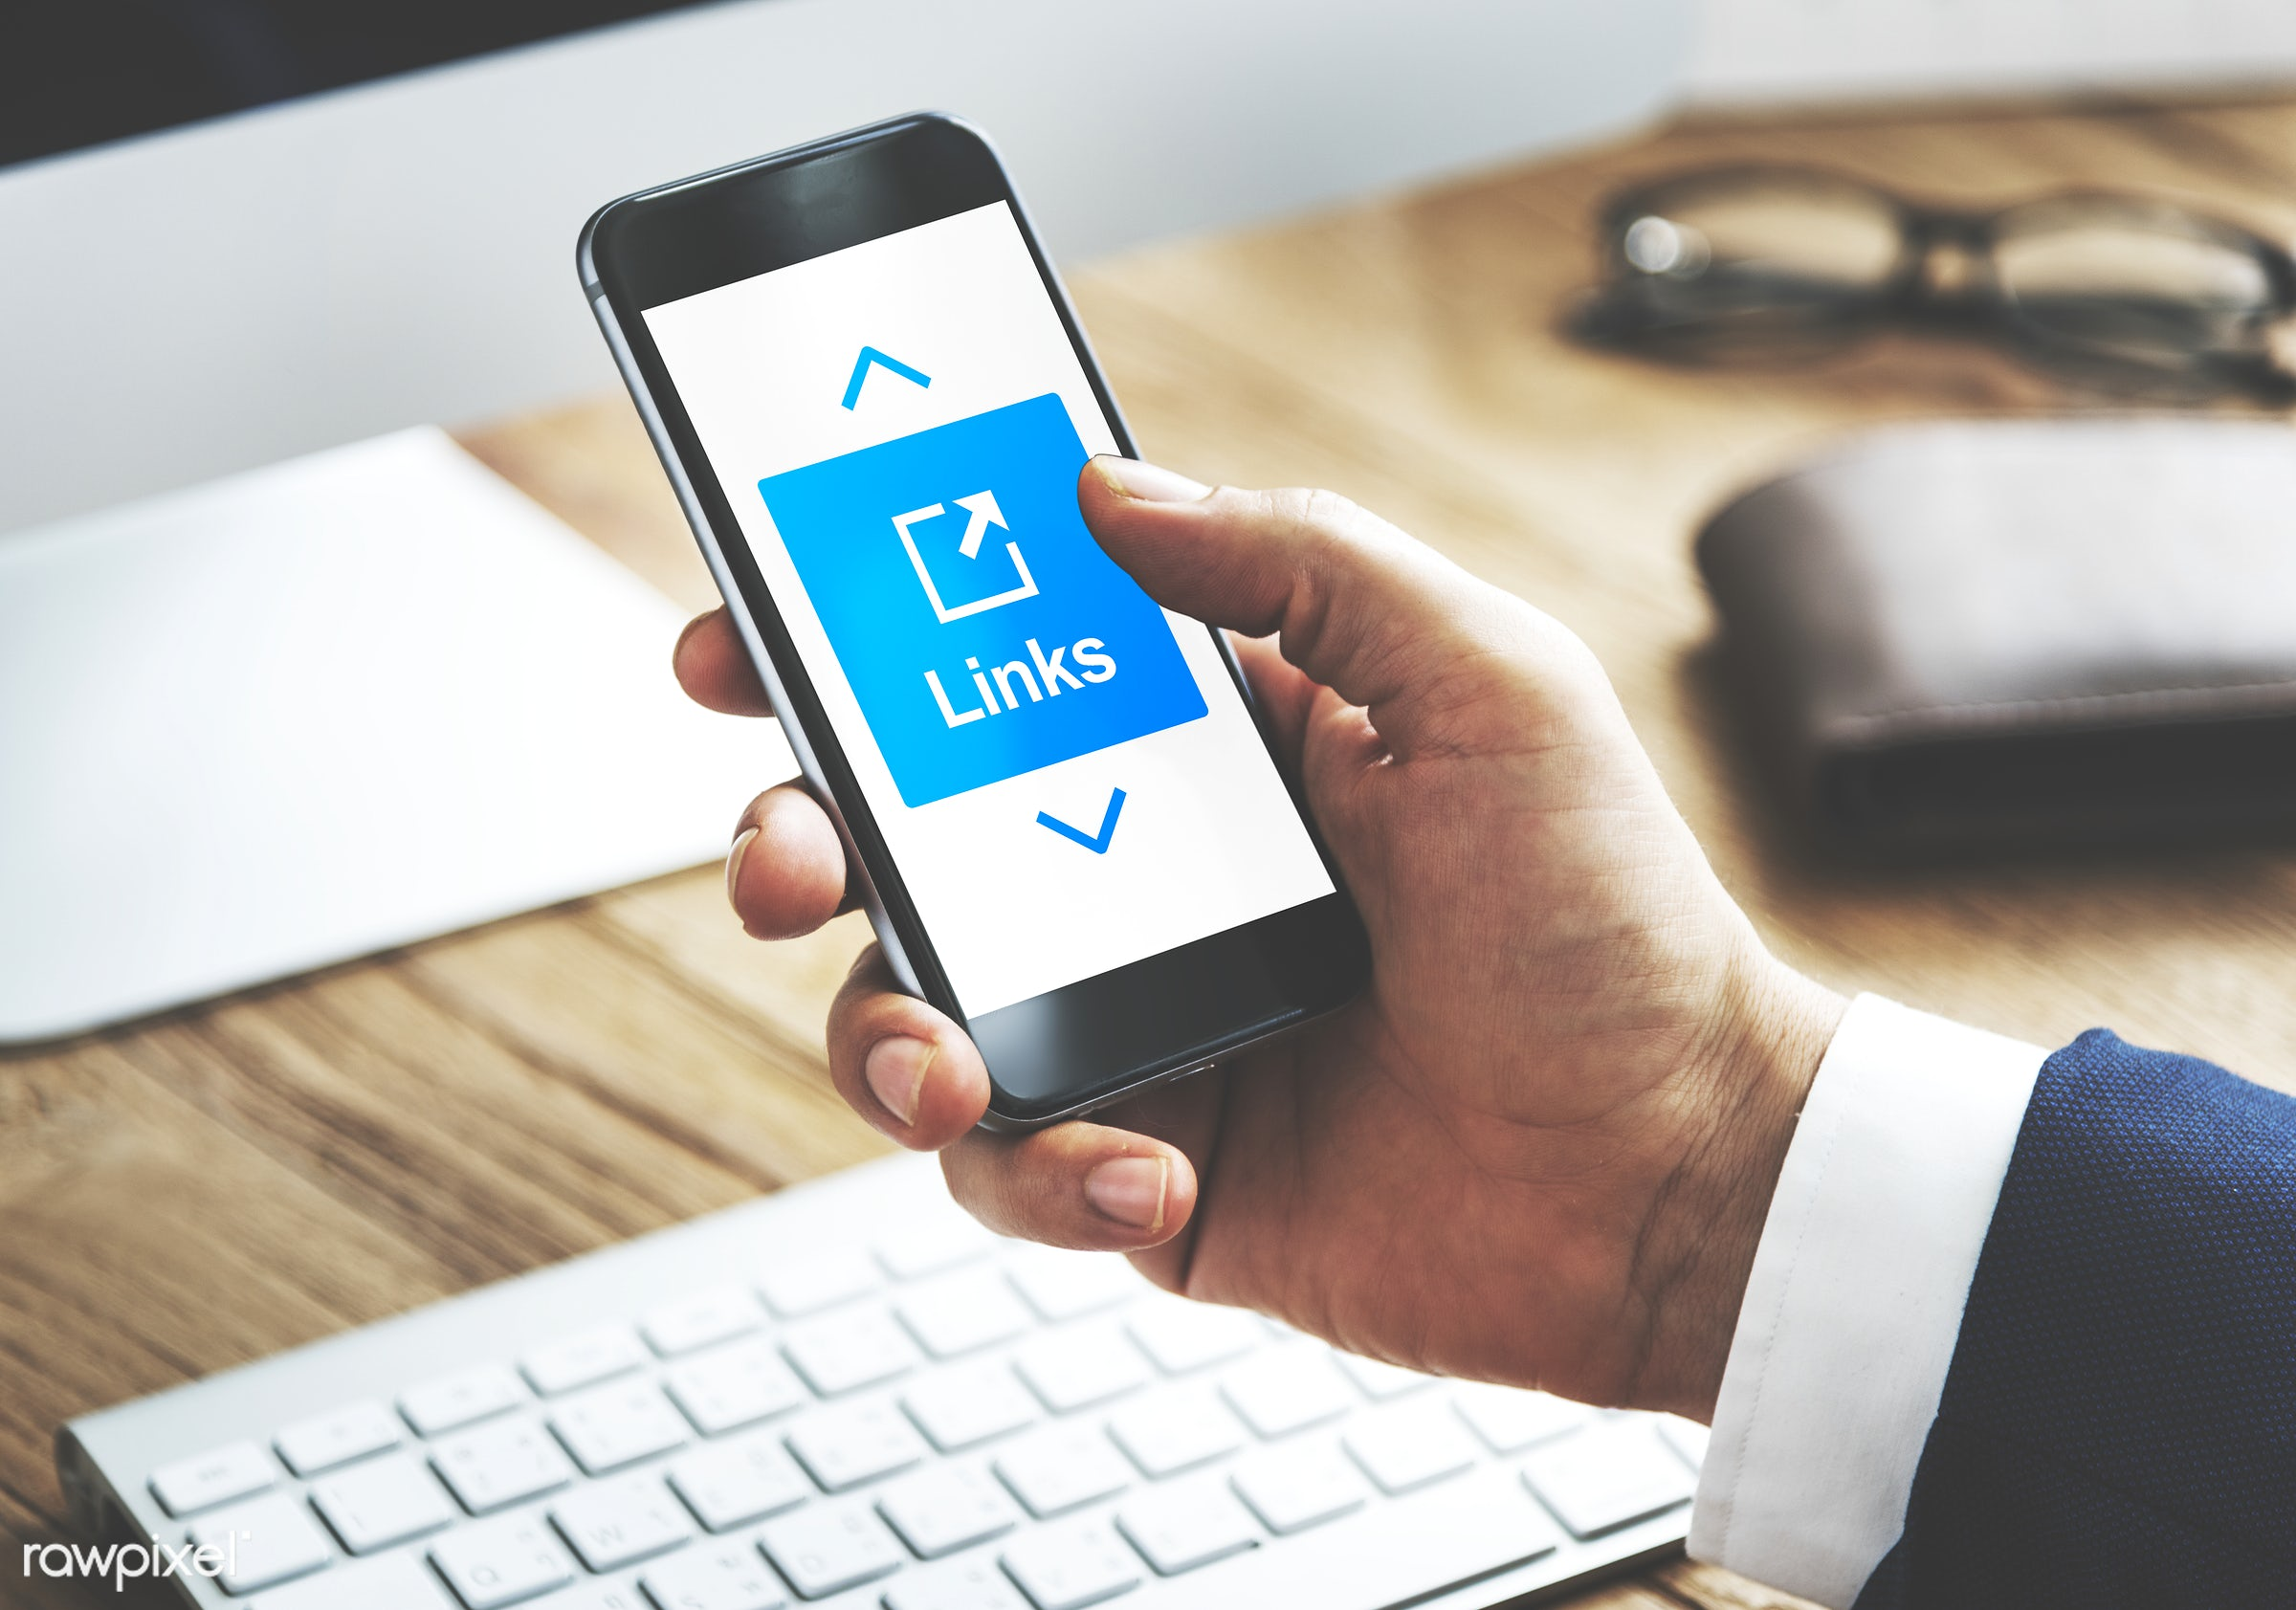 browsing, business, businessman, chat, communication, community, connect, connection, data, desk, device, digital, digital...